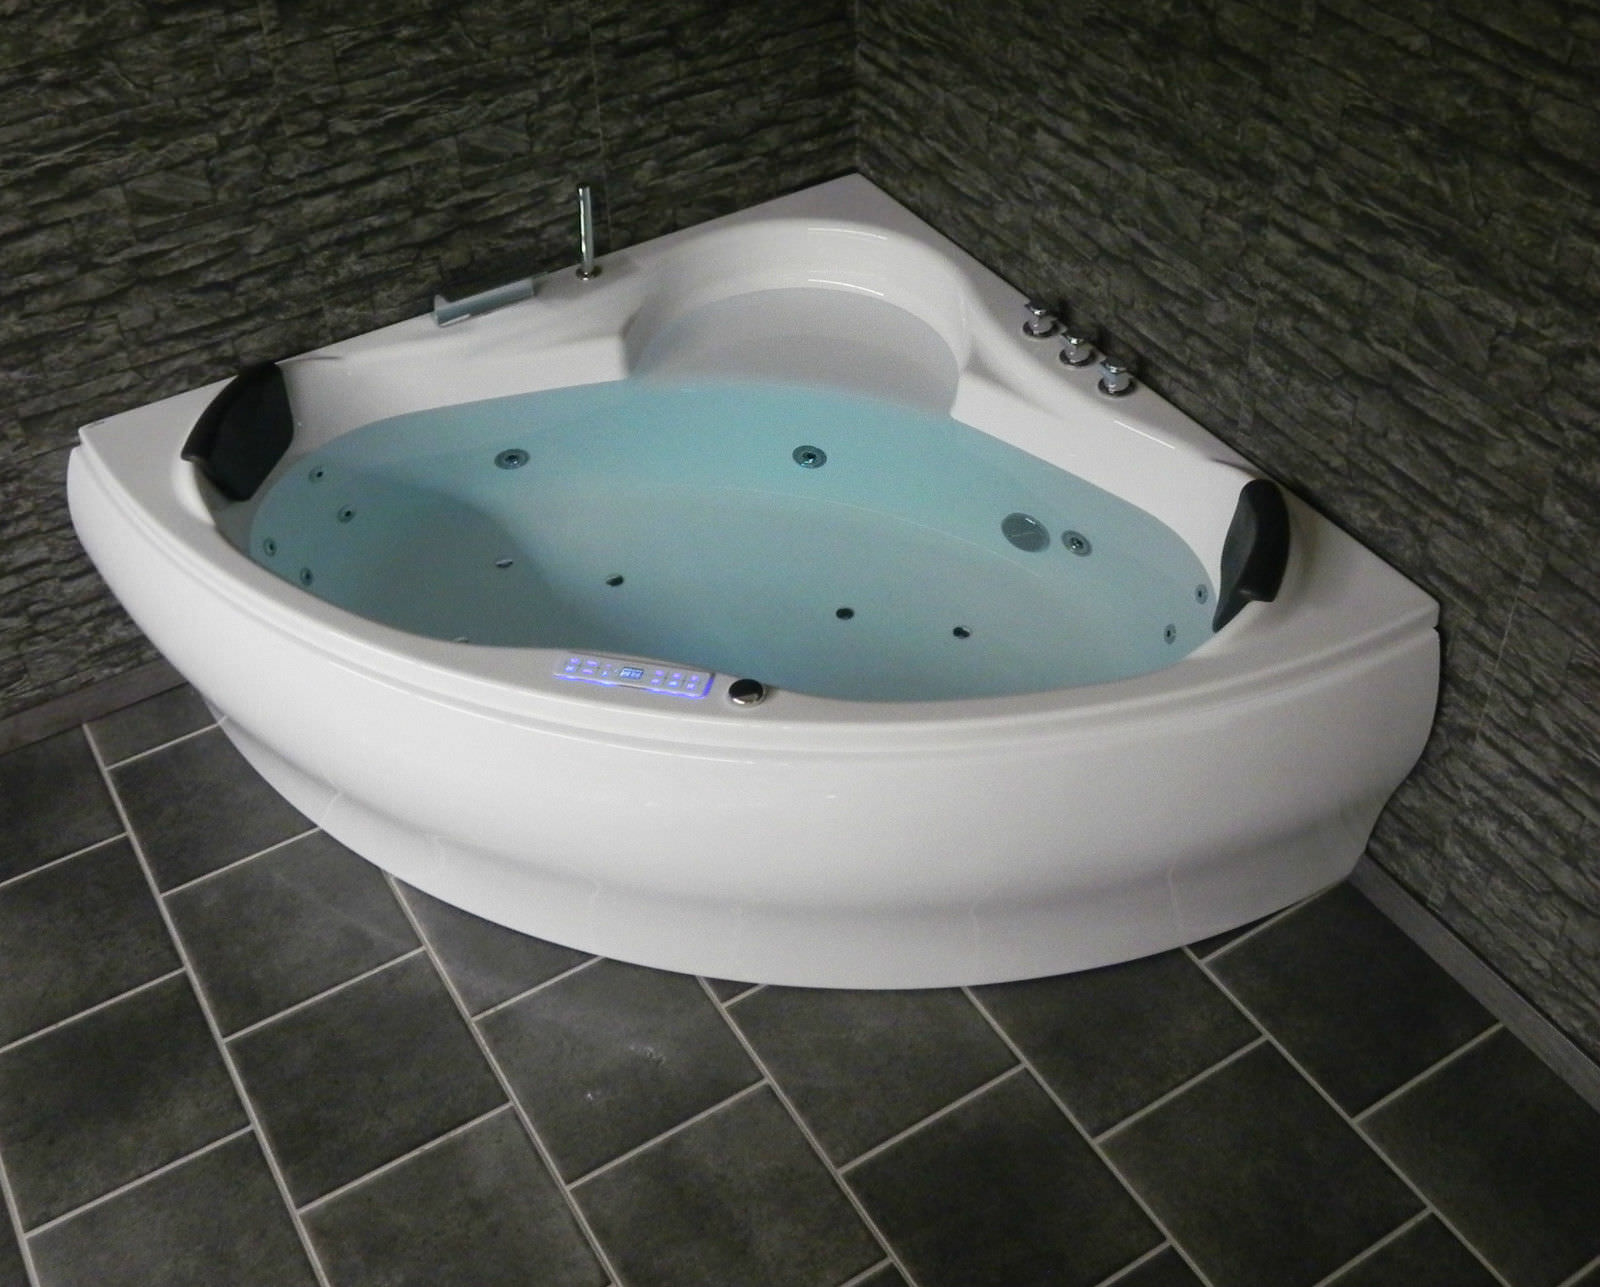 Corner whirlpool whirlpool bathtub jacuzzi pool dina made for Whirlpool einlage badewanne